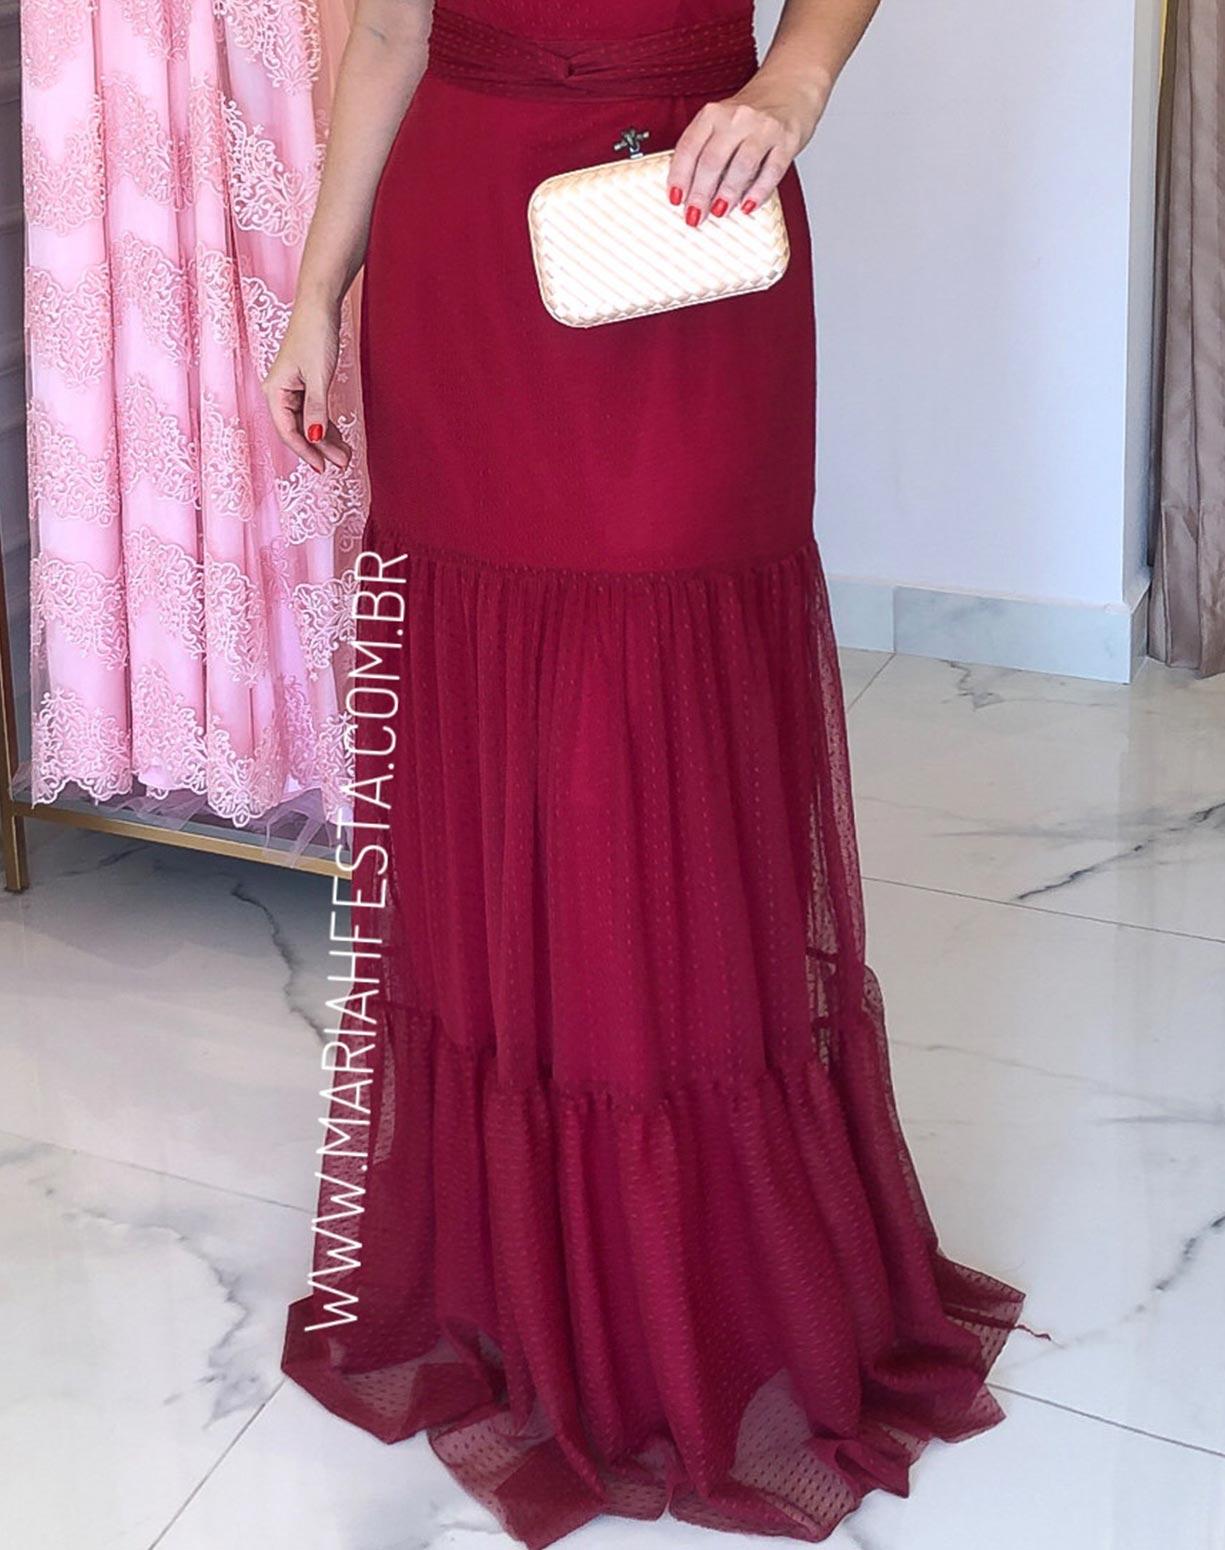 Vestido Marsala em Tule Texturizado